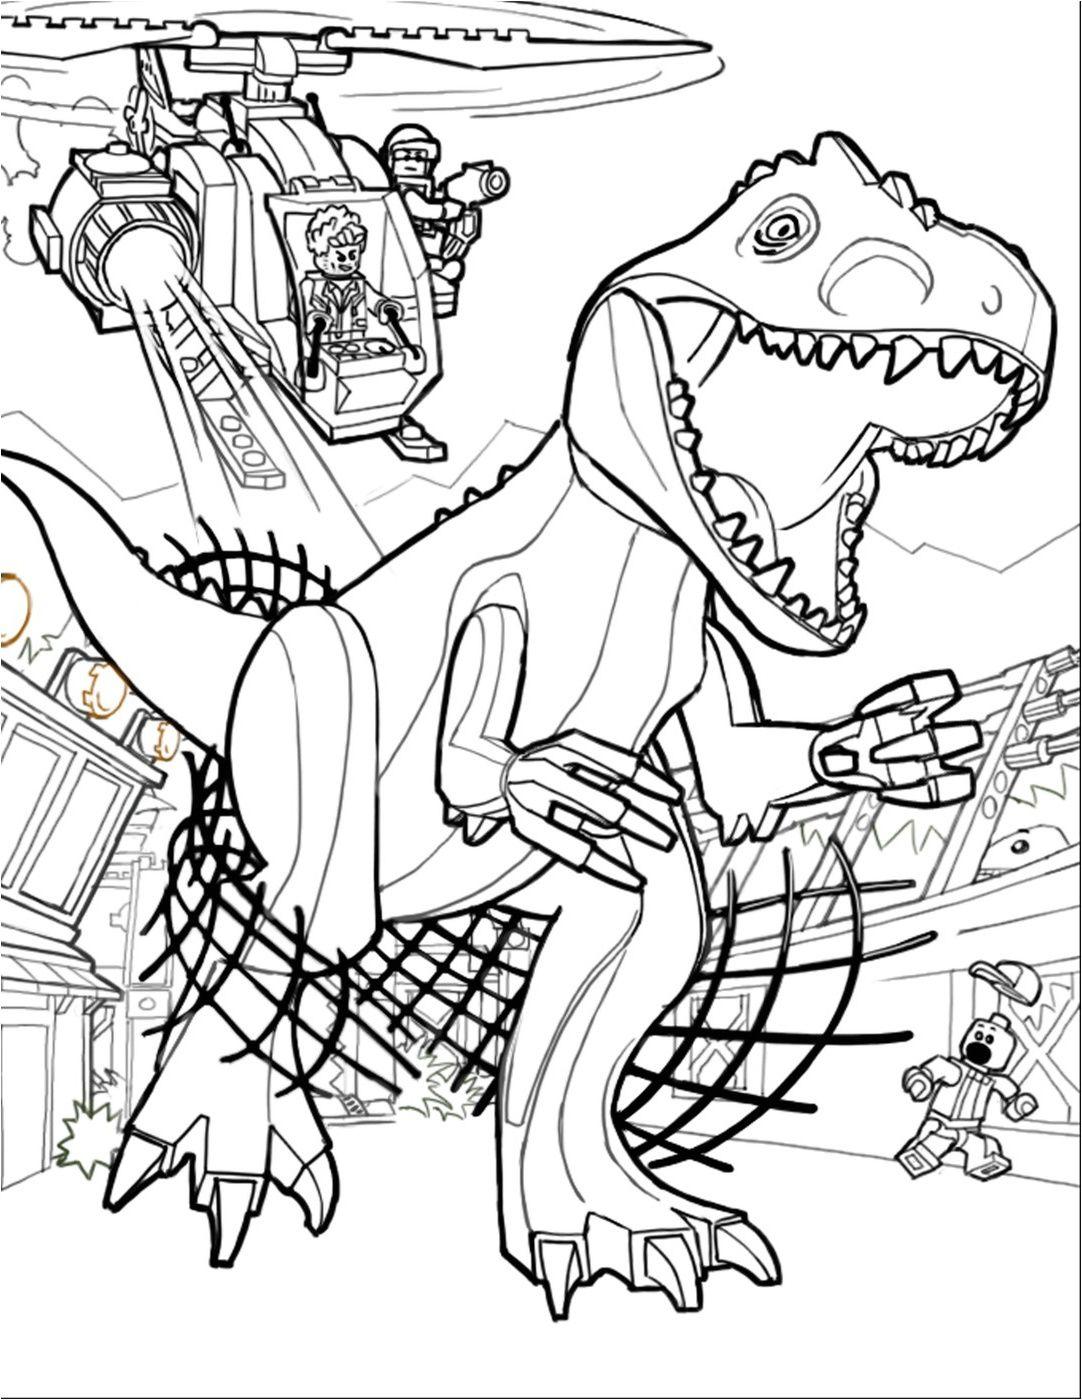 Coloriage Jurassic World T Rex Coloriage Jurassic World Coloriage Coloriage Lego